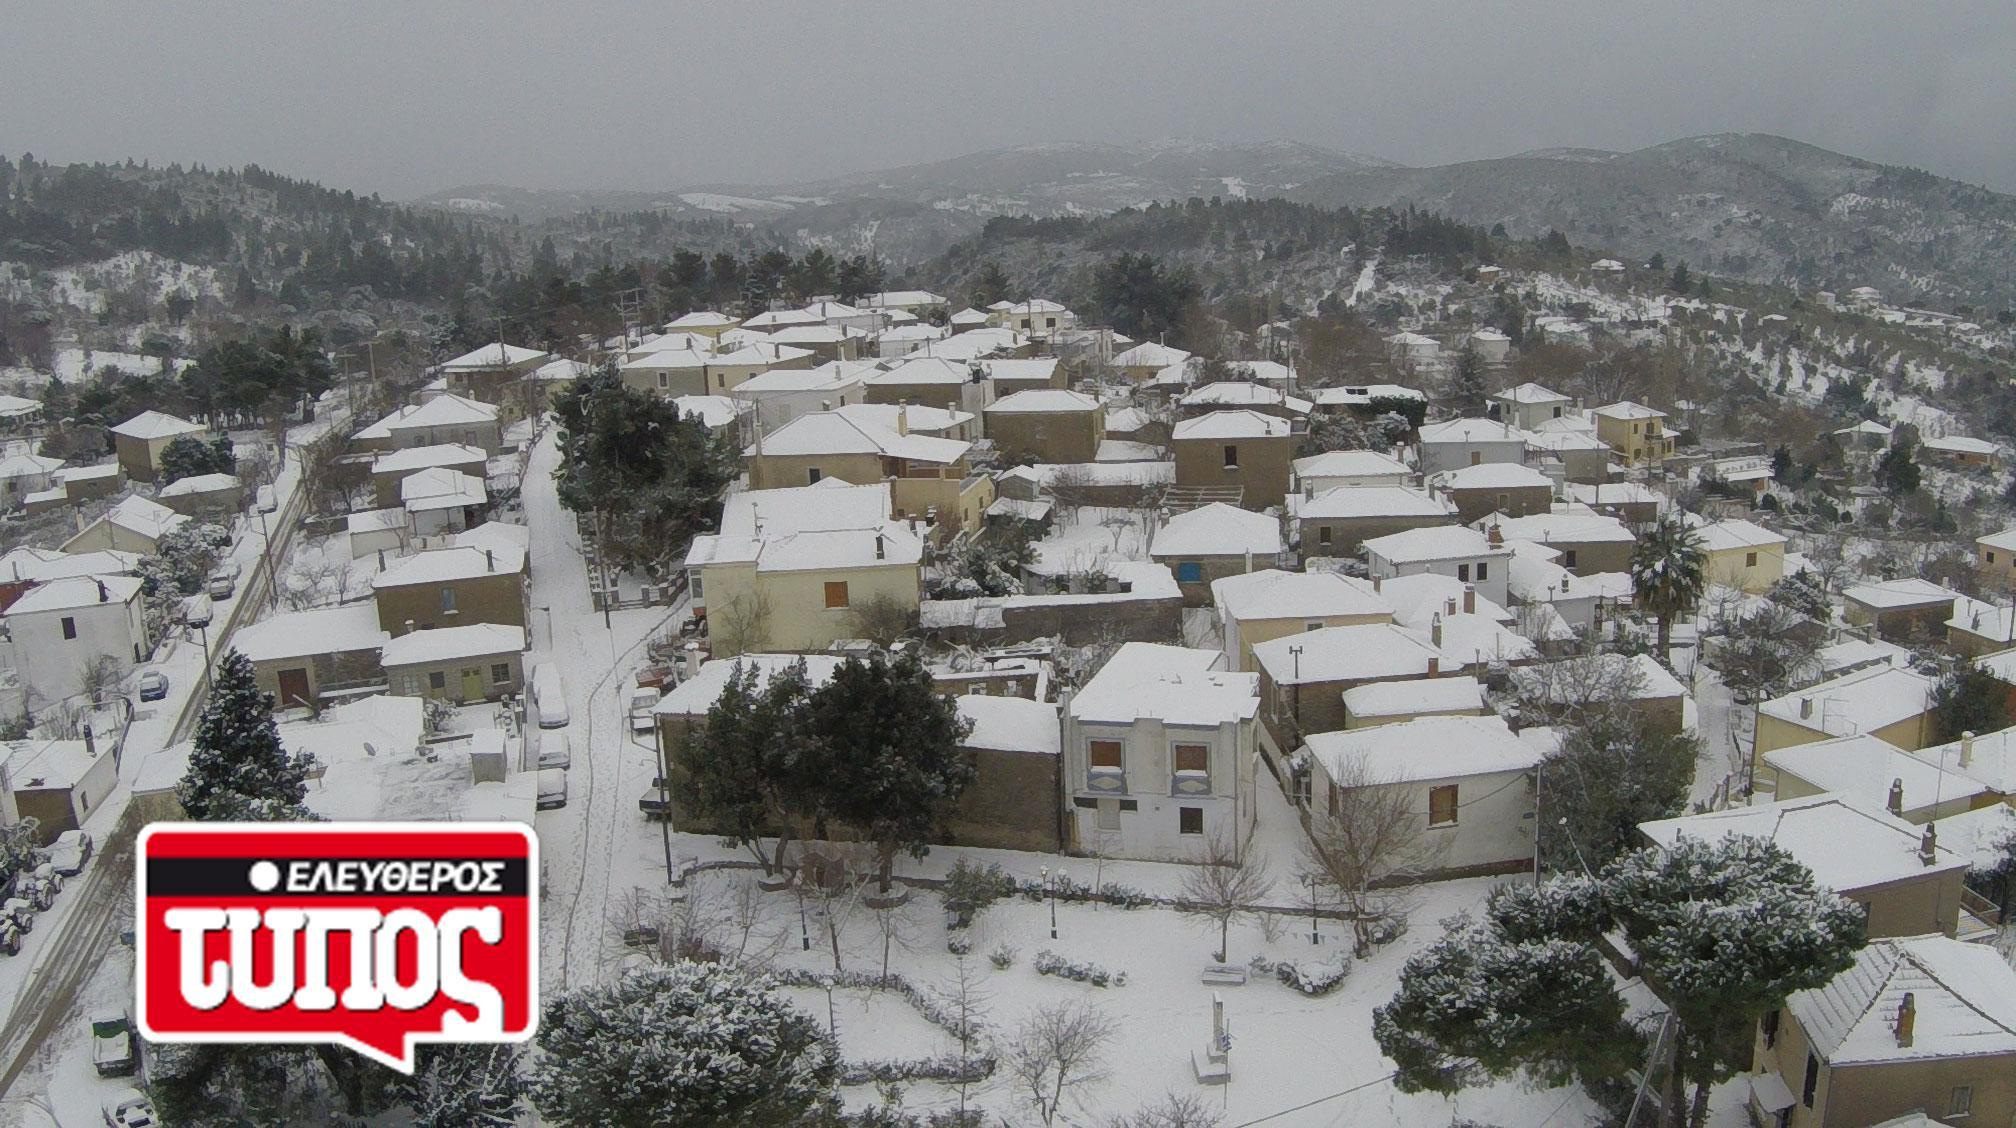 laukos-piliou-xionismenos-aerofotografies-1300-4 Εντυπωσιακές αεροφωτογραφίες από το χιονισμένο Λαύκο Πηλίου [εικόνες]